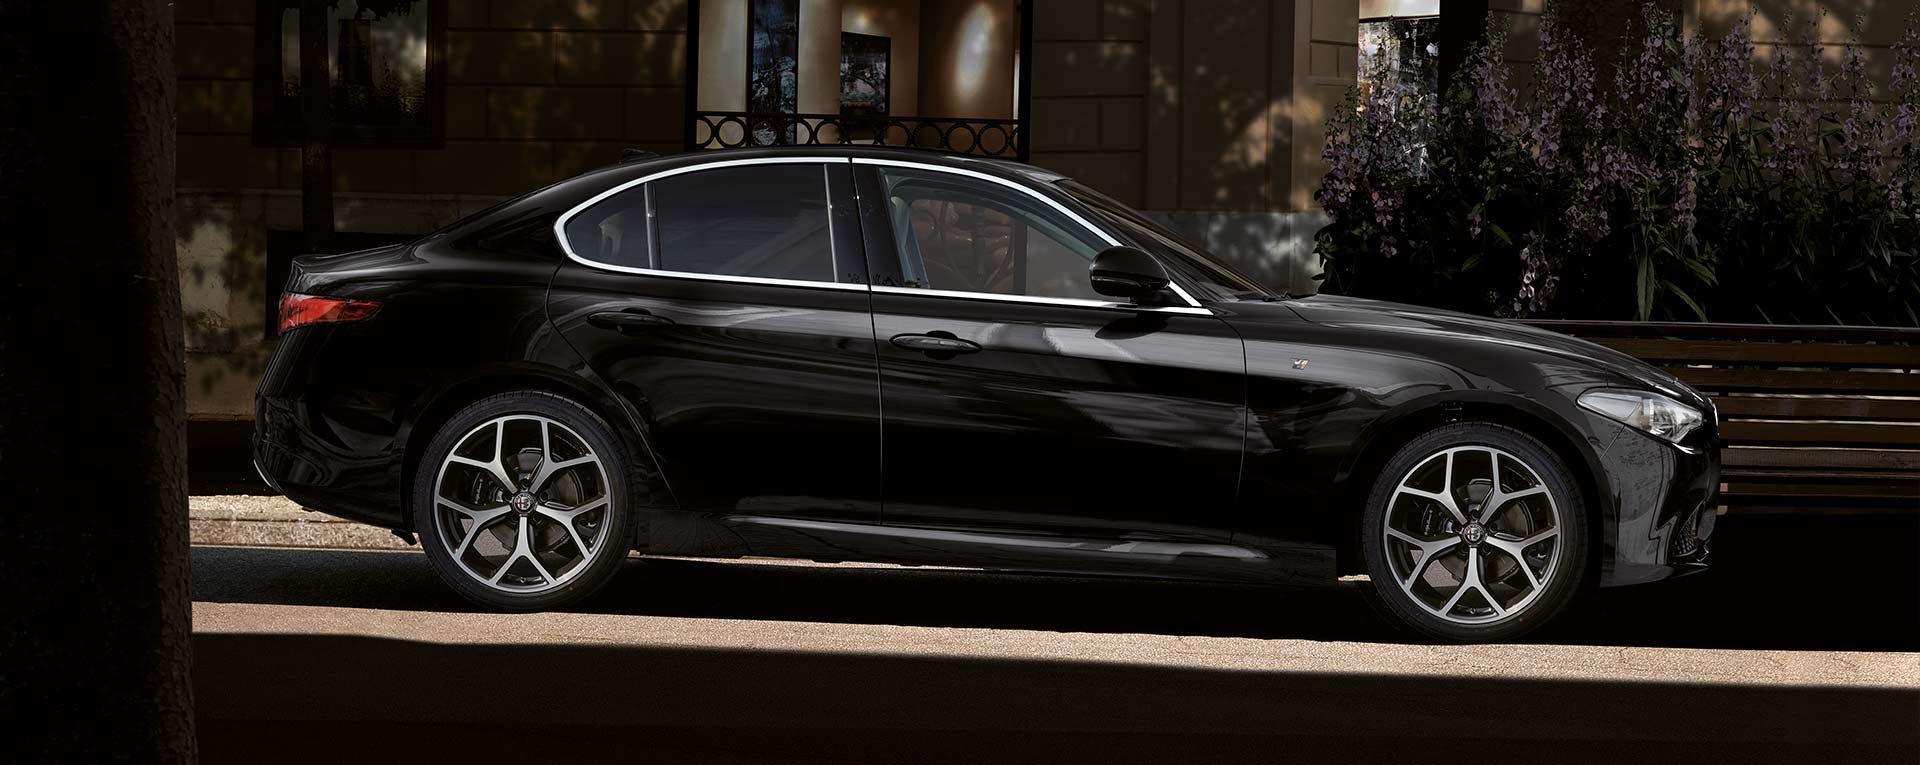 best-cars-2021-alfa-romeo-giulia